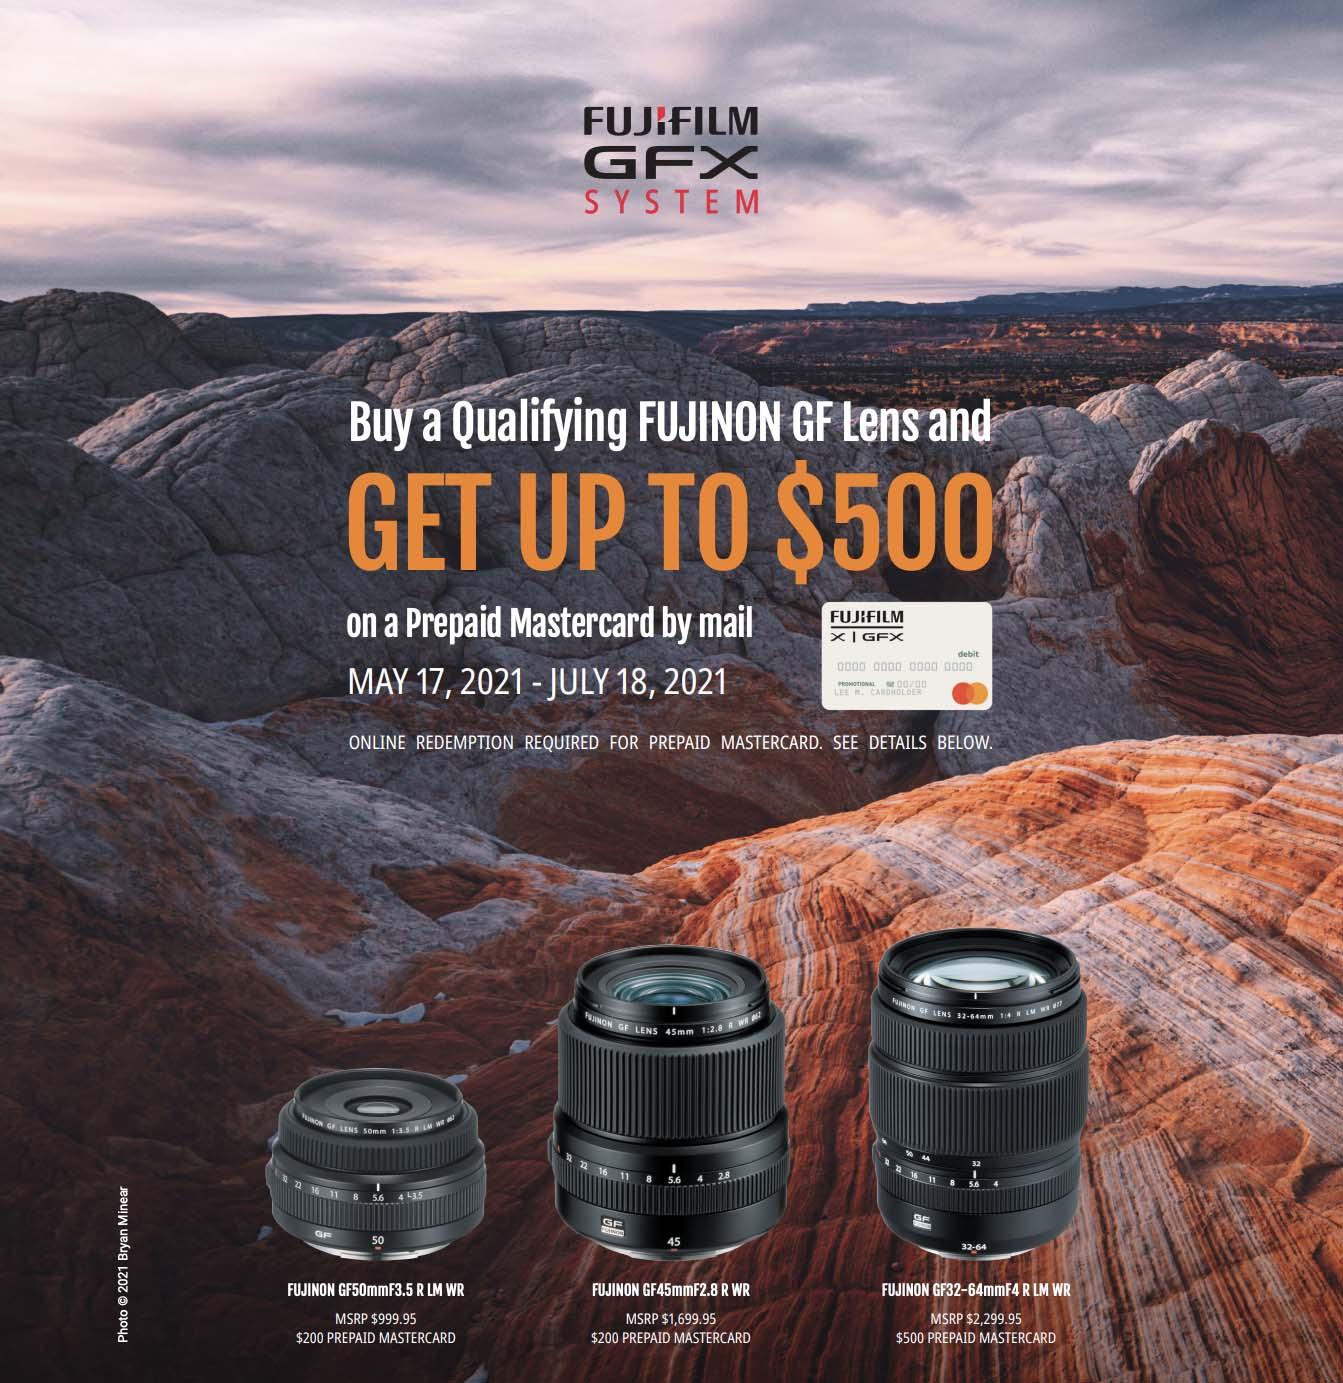 Fujifilm mirrorless cameras and lens shortages, Fujicolor PRO400H film discontinued, Xerox acquisition